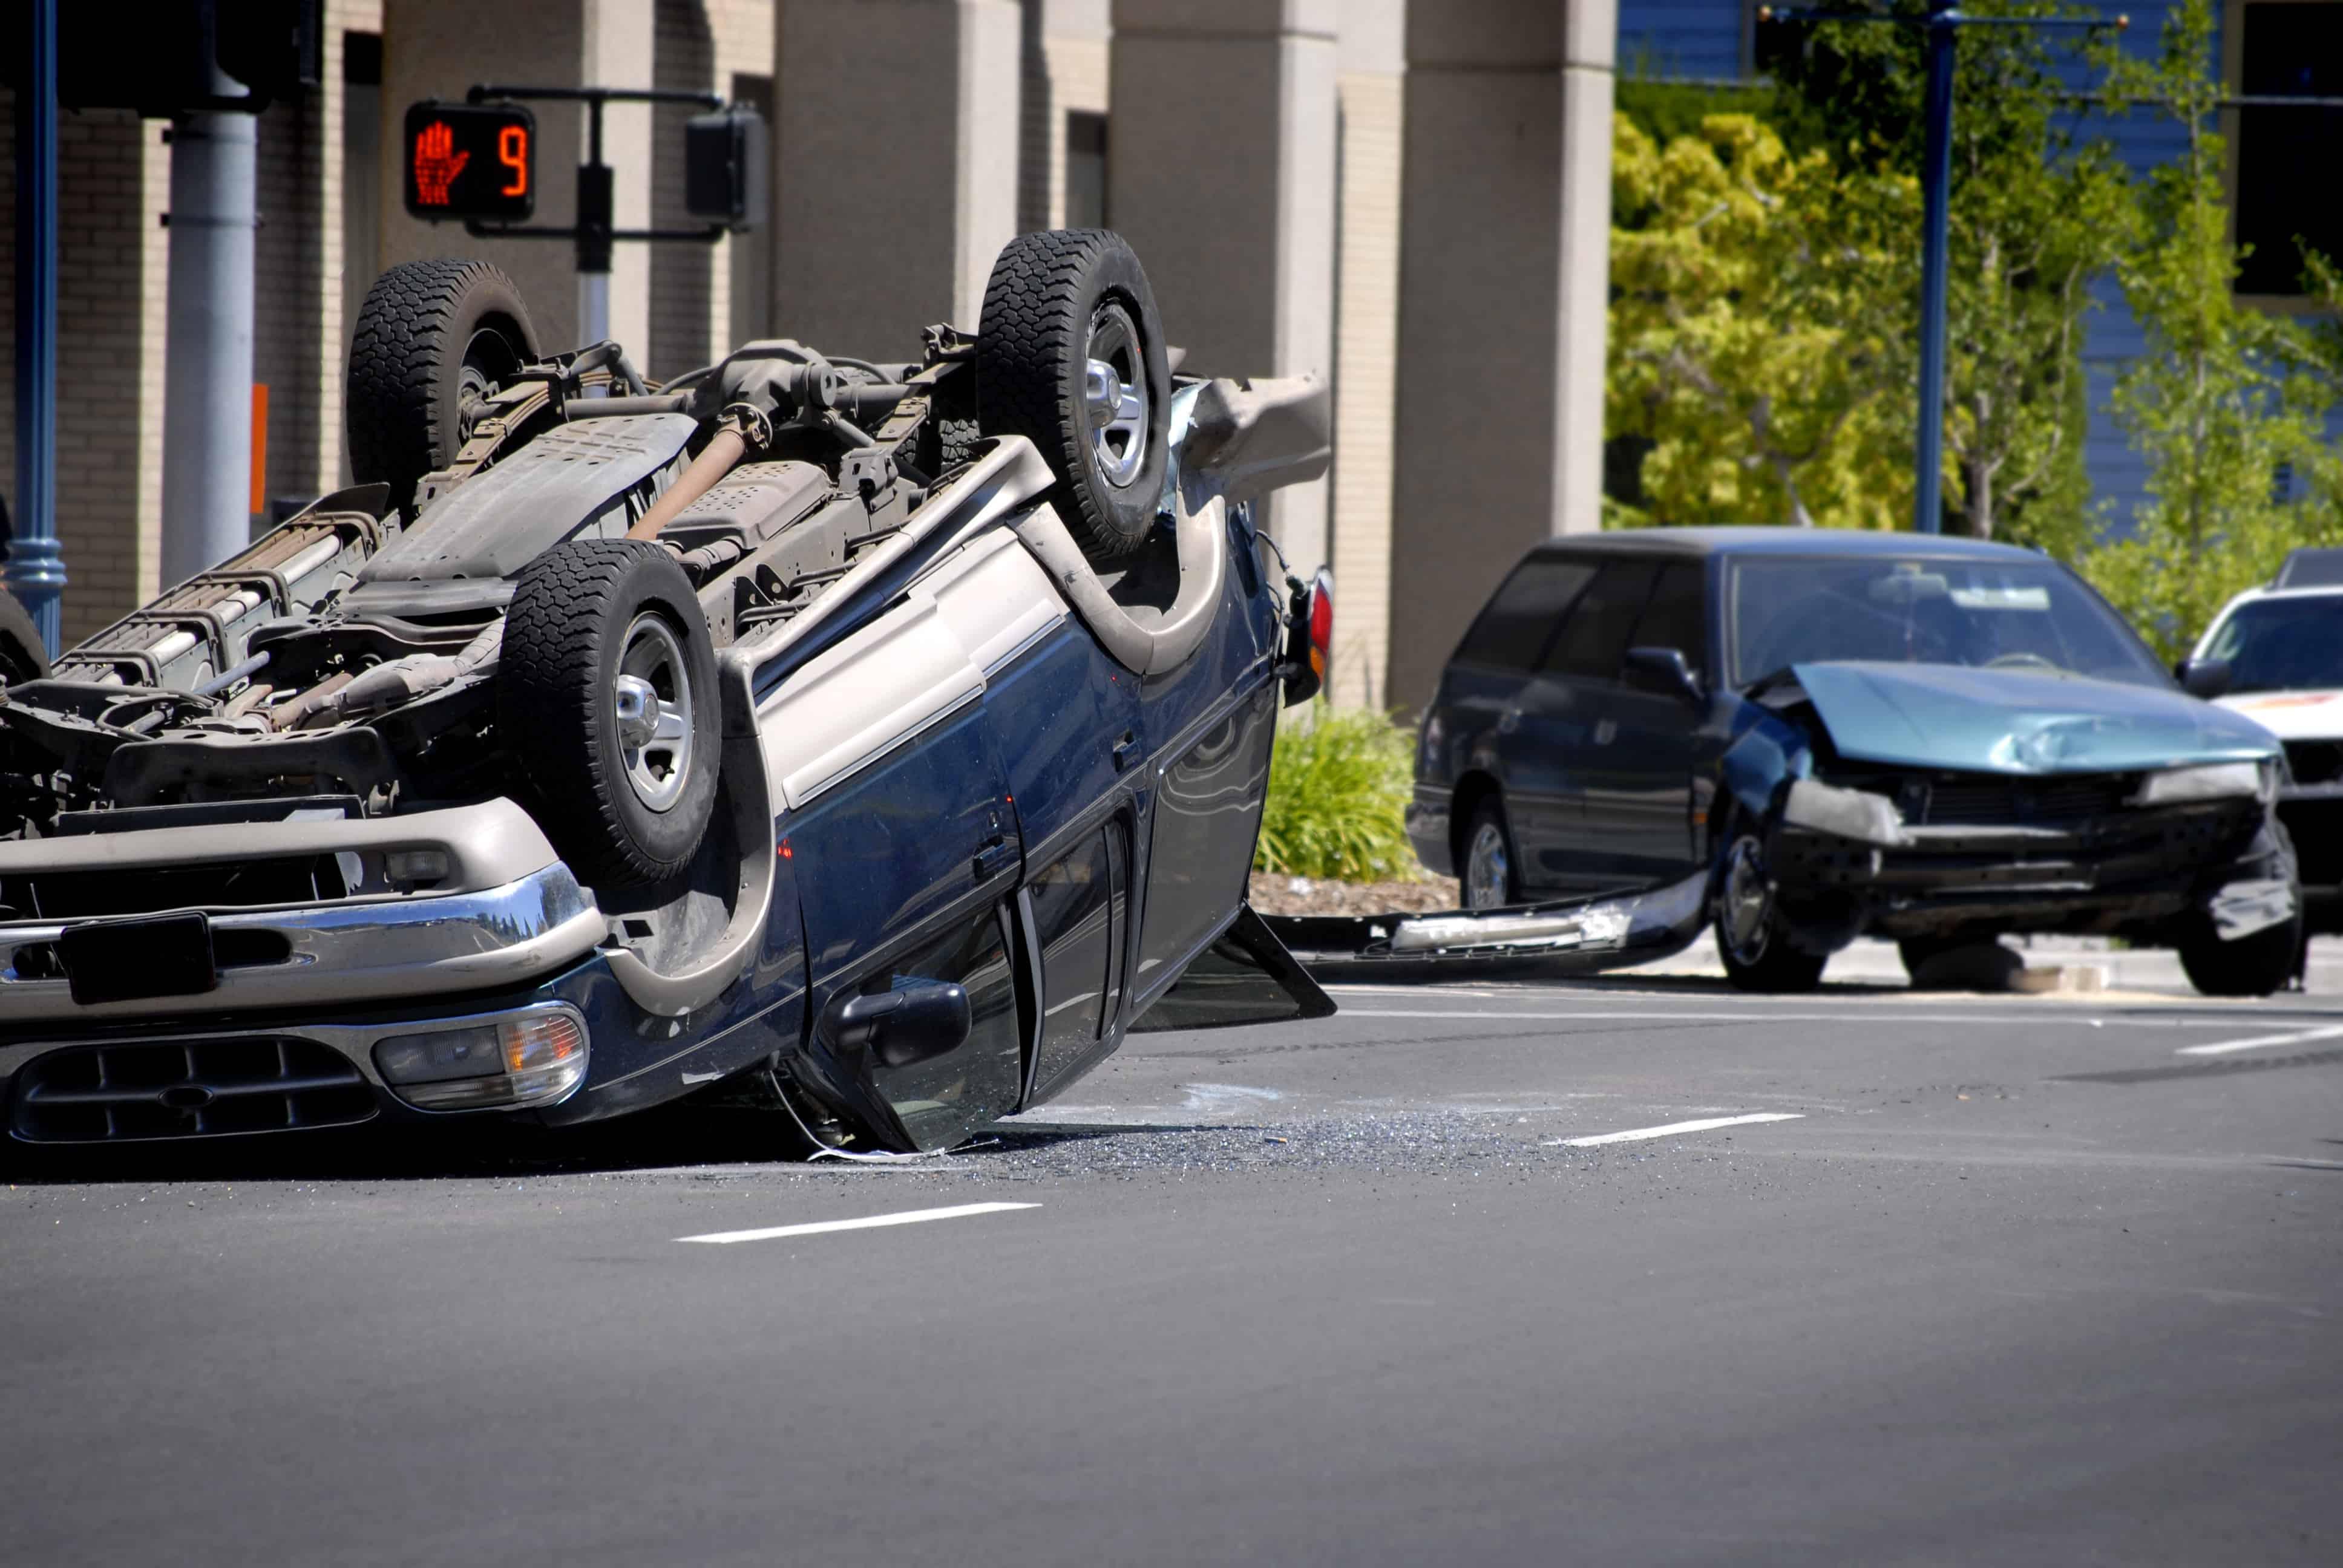 Interstate 5 Overturn Crash Kills David Hamilton [Bakersfield, CA]